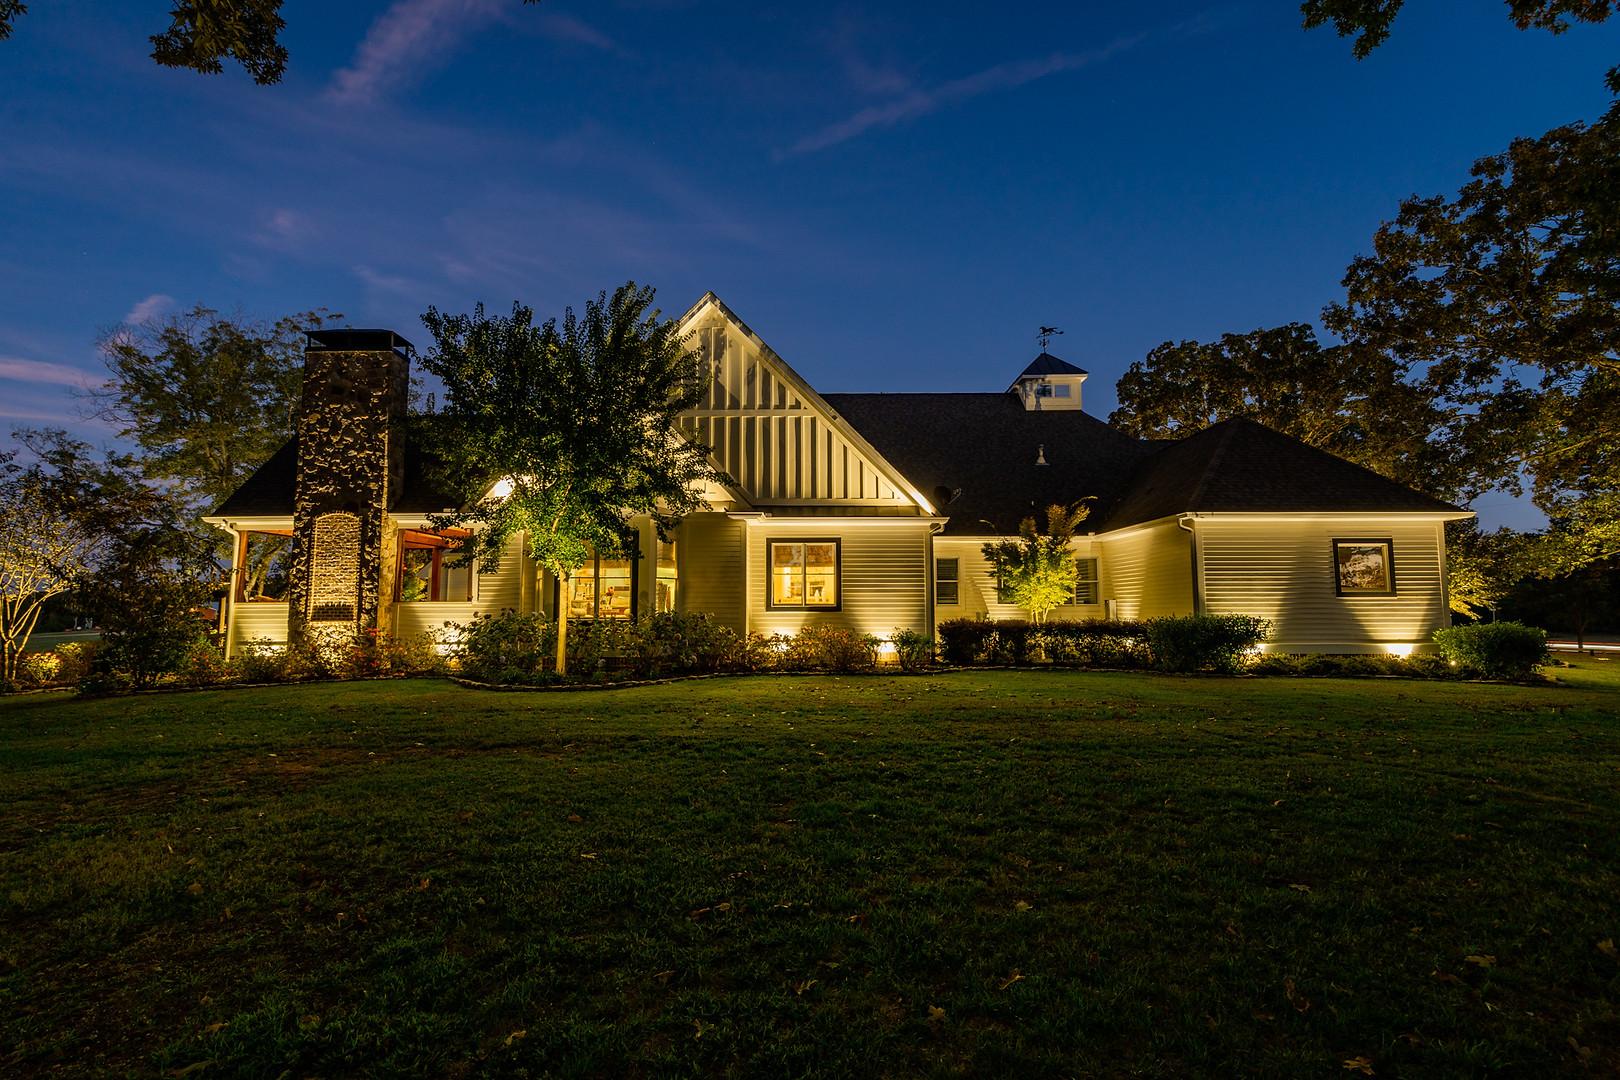 Architectural Lighting & Tree Lighting